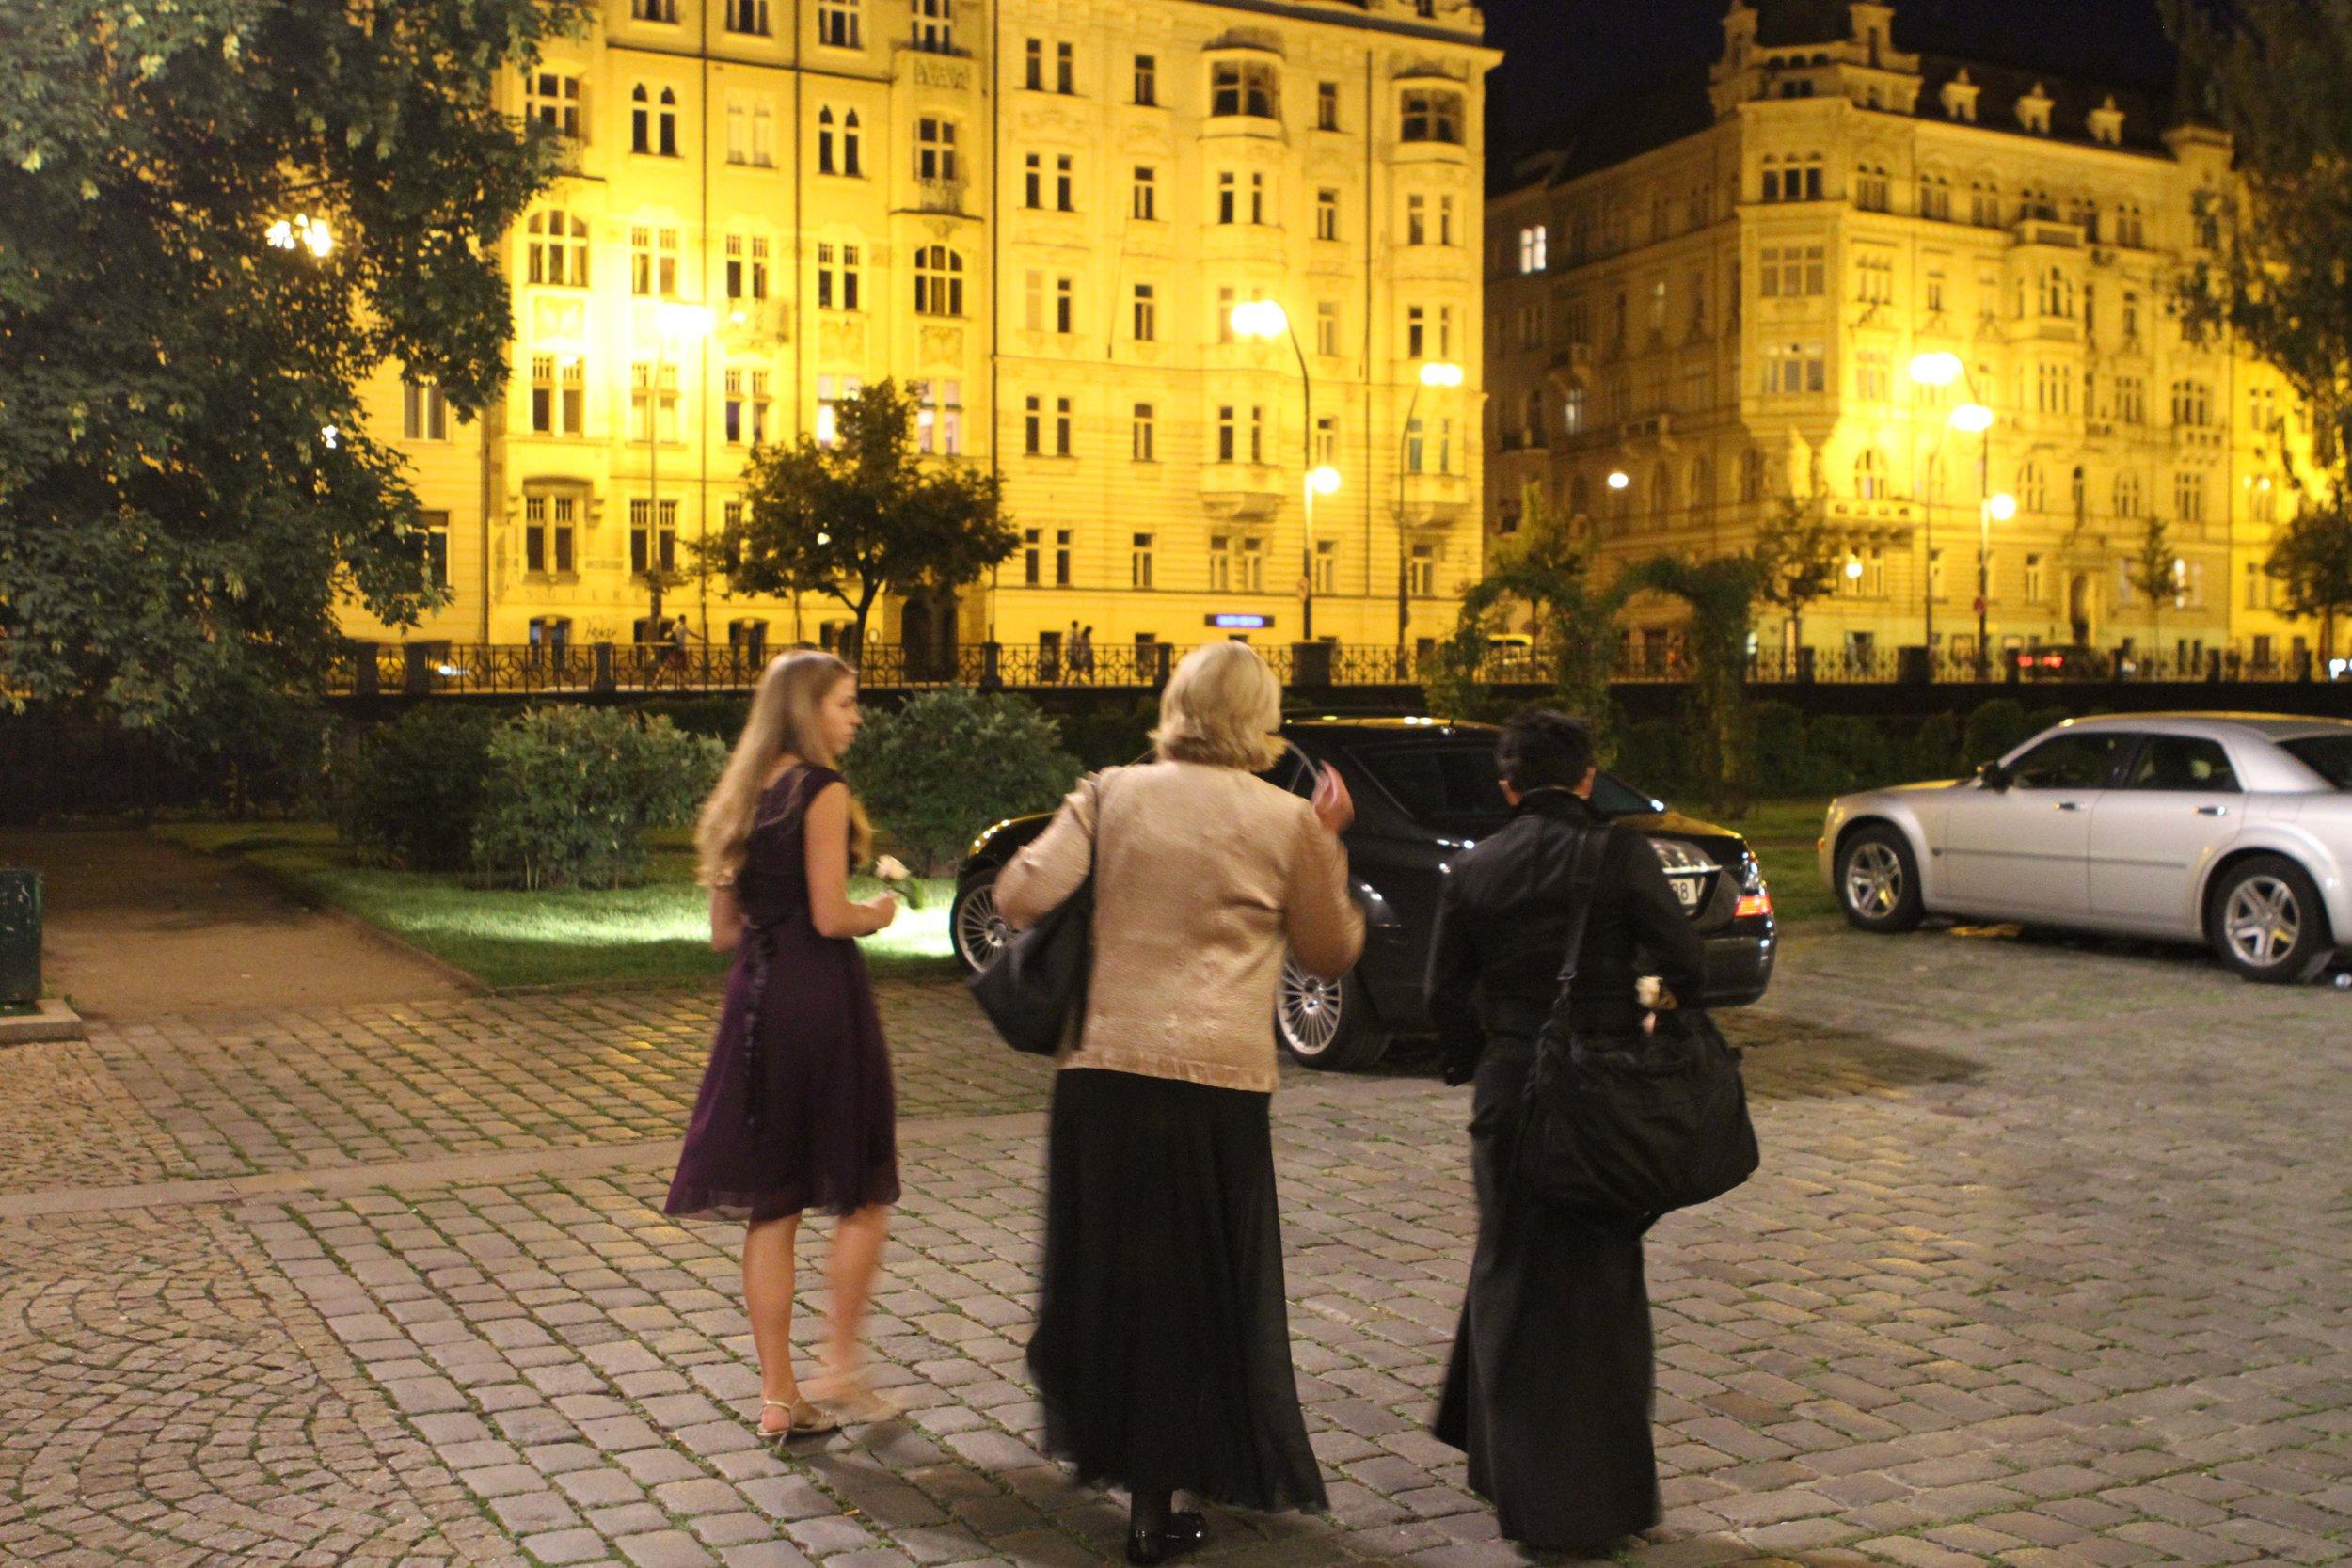 Jeannine Goeckeritz - Flute - Žofín Palace Concert -Live Performance - Prague, Czech Republic.jpg